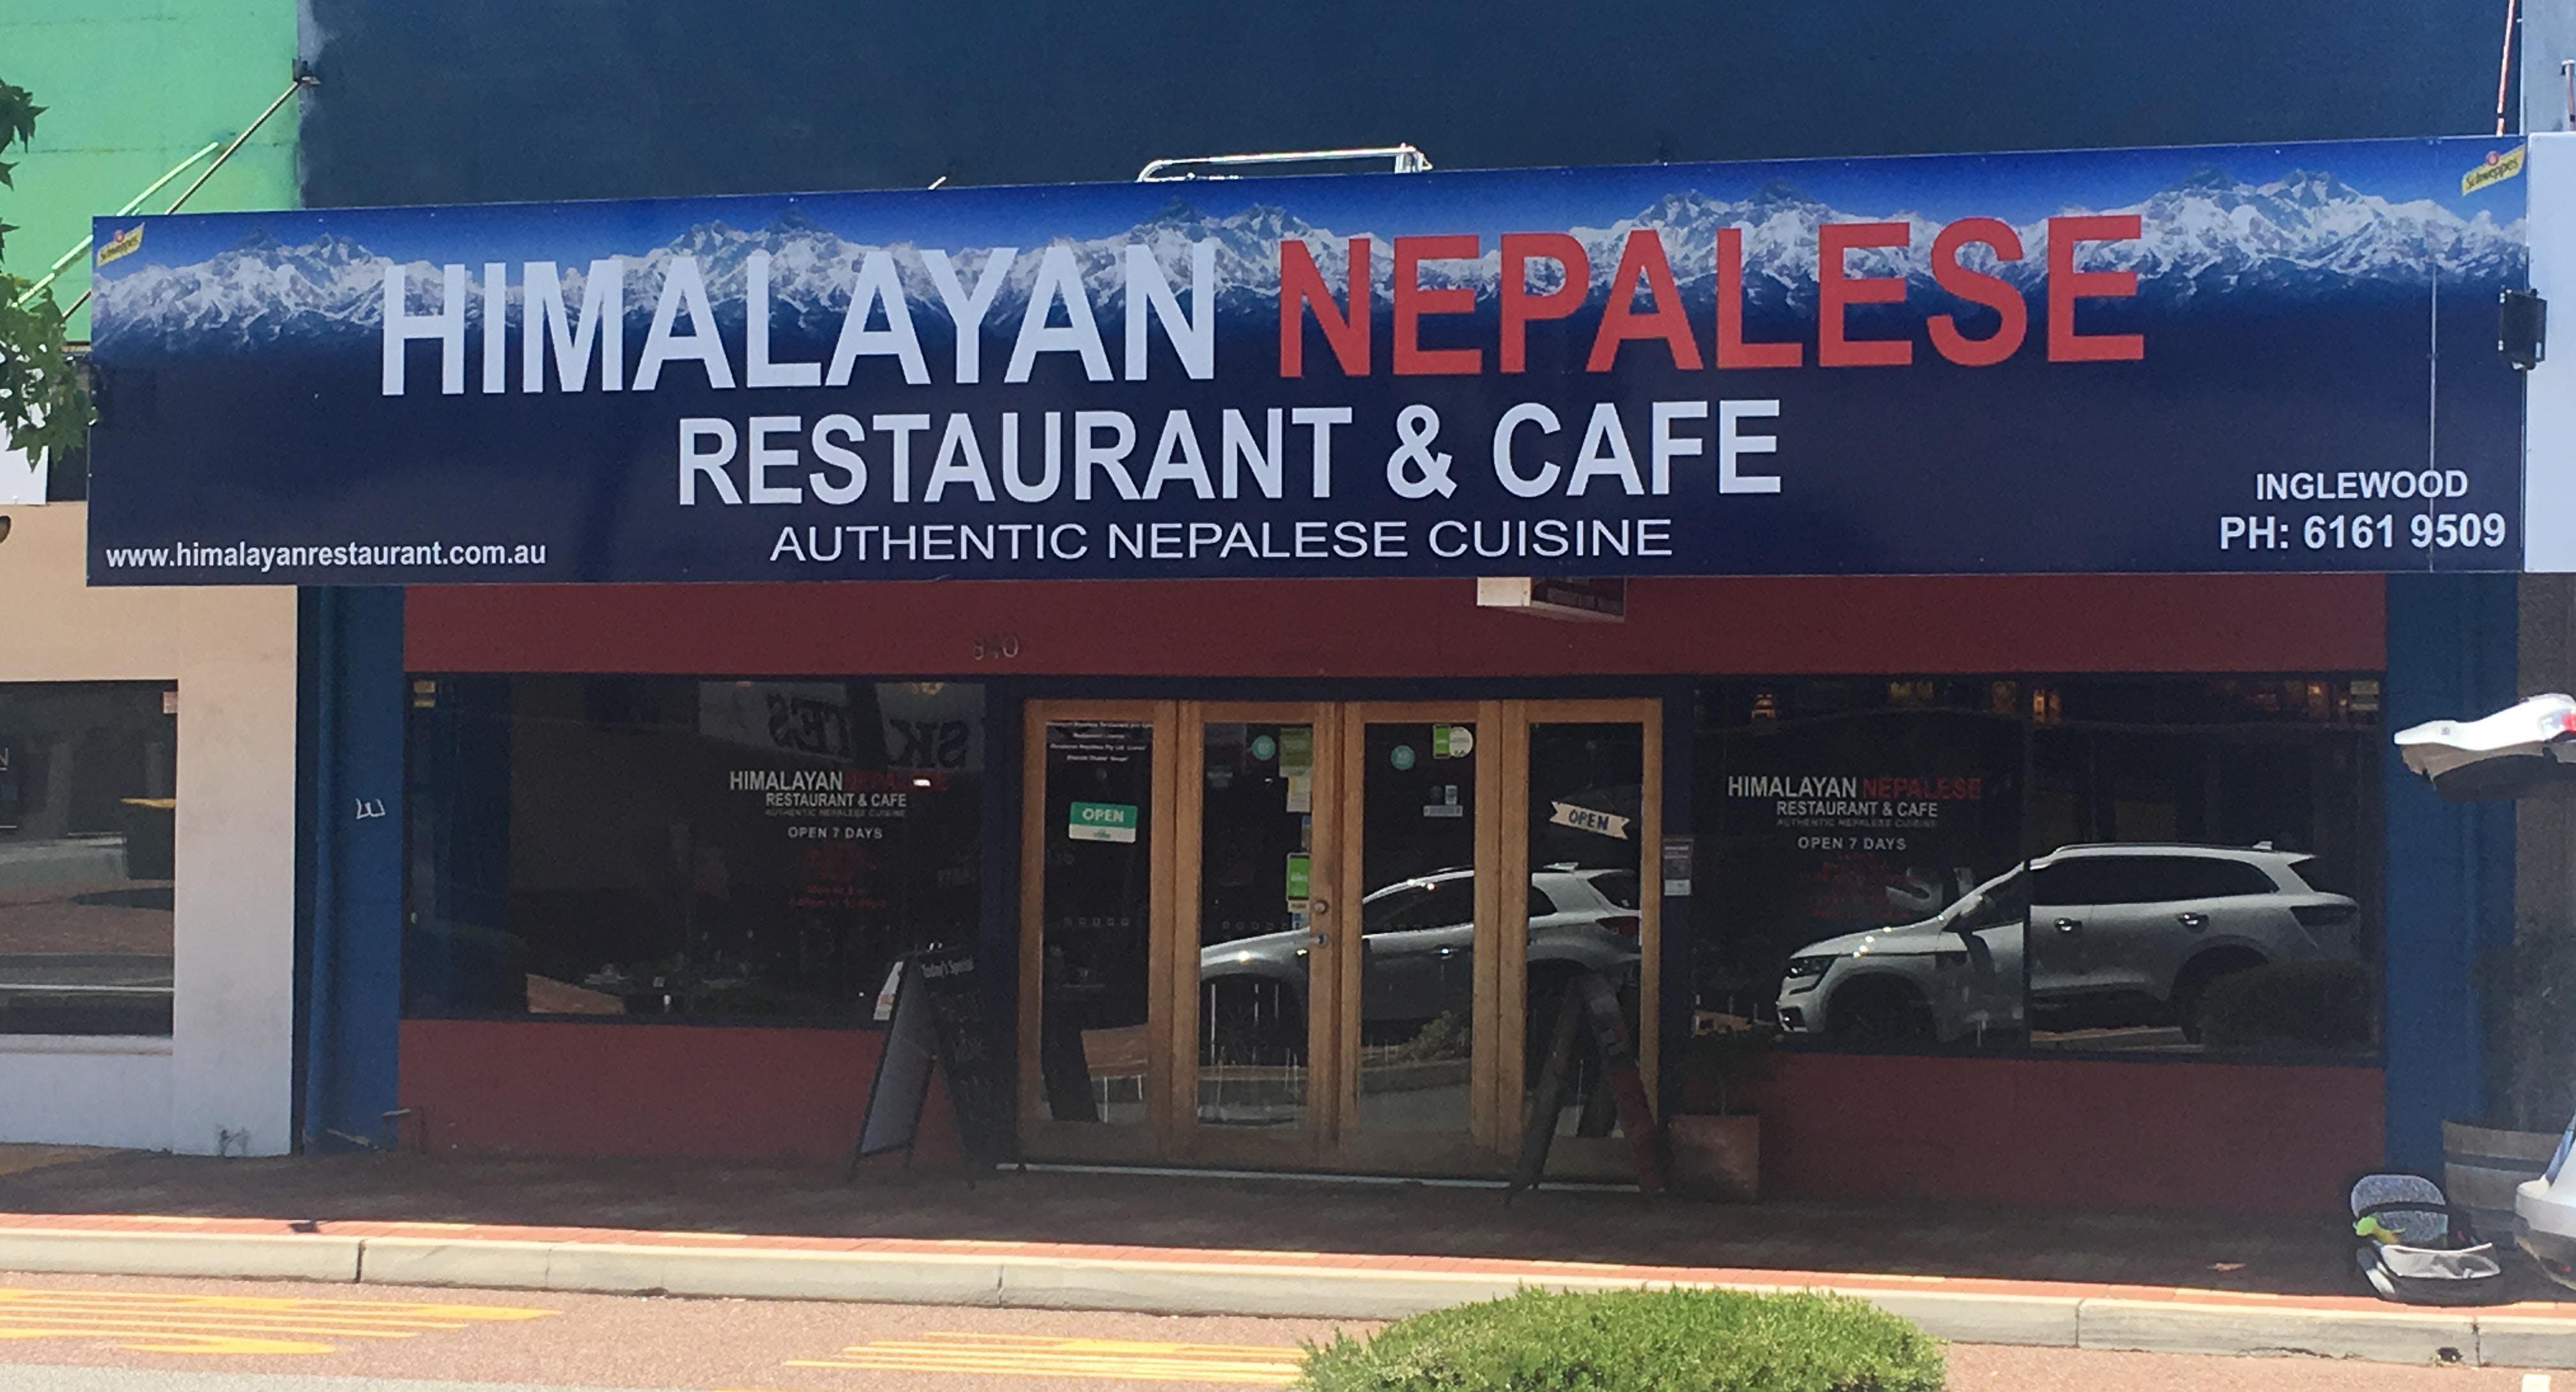 Himalayan Nepalese Restaurant & Cafe - Inglewood Perth image 2